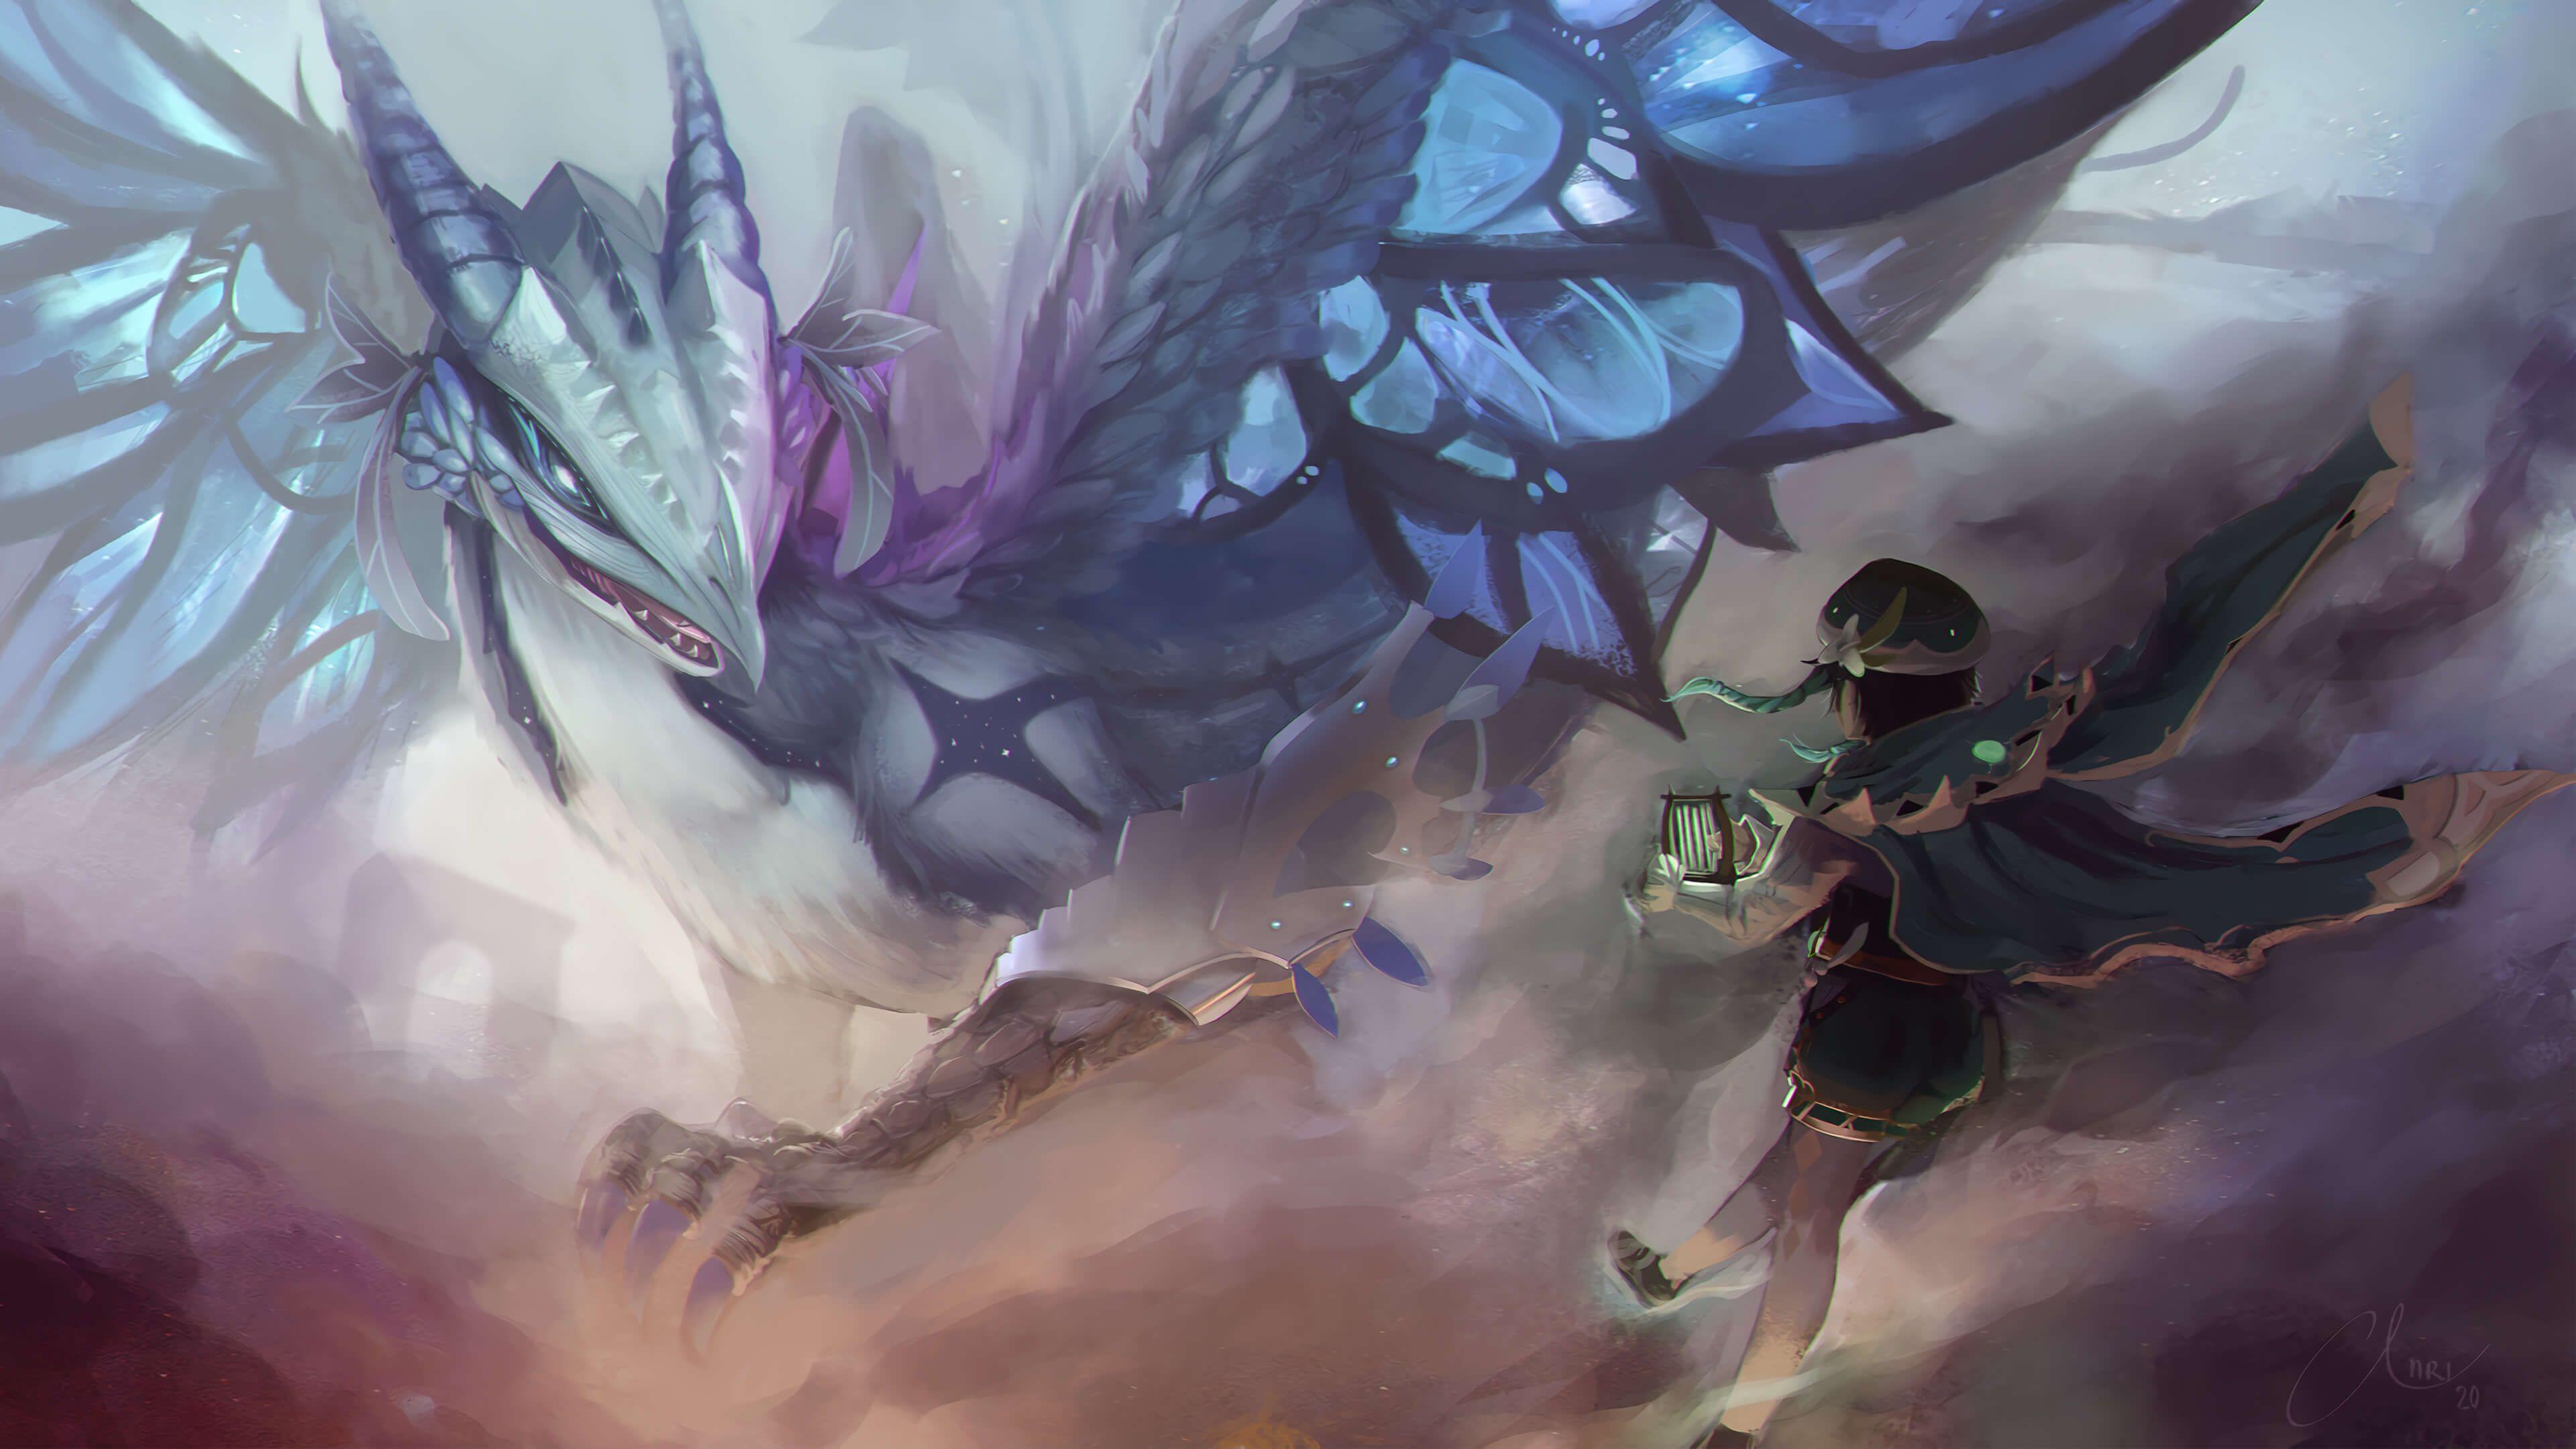 Genshin Impact Wallpaper In 2020 Anime Fantasy Wallpaper Impact